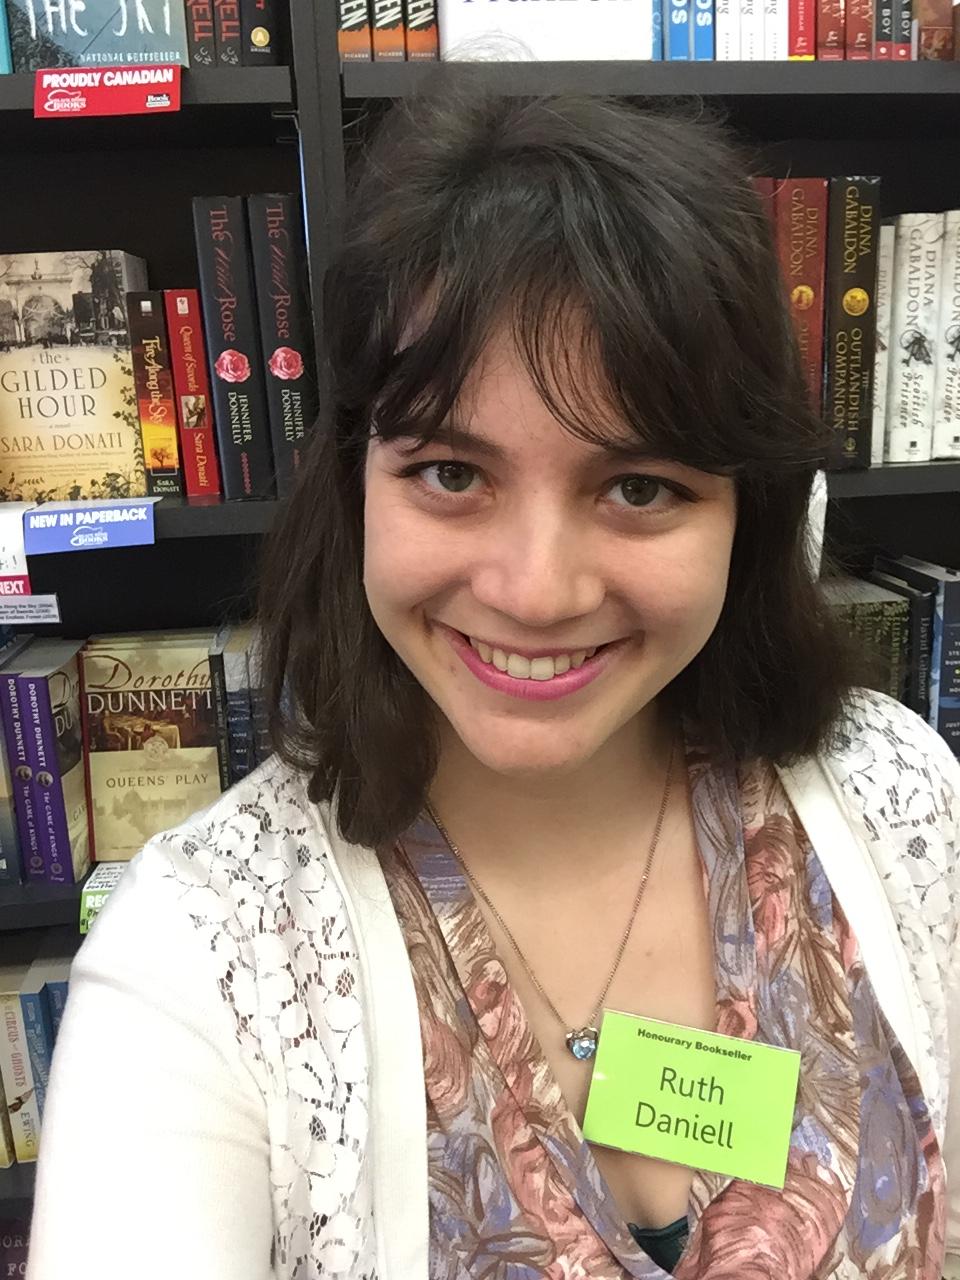 Ruth Daniell: Honourary Bookseller